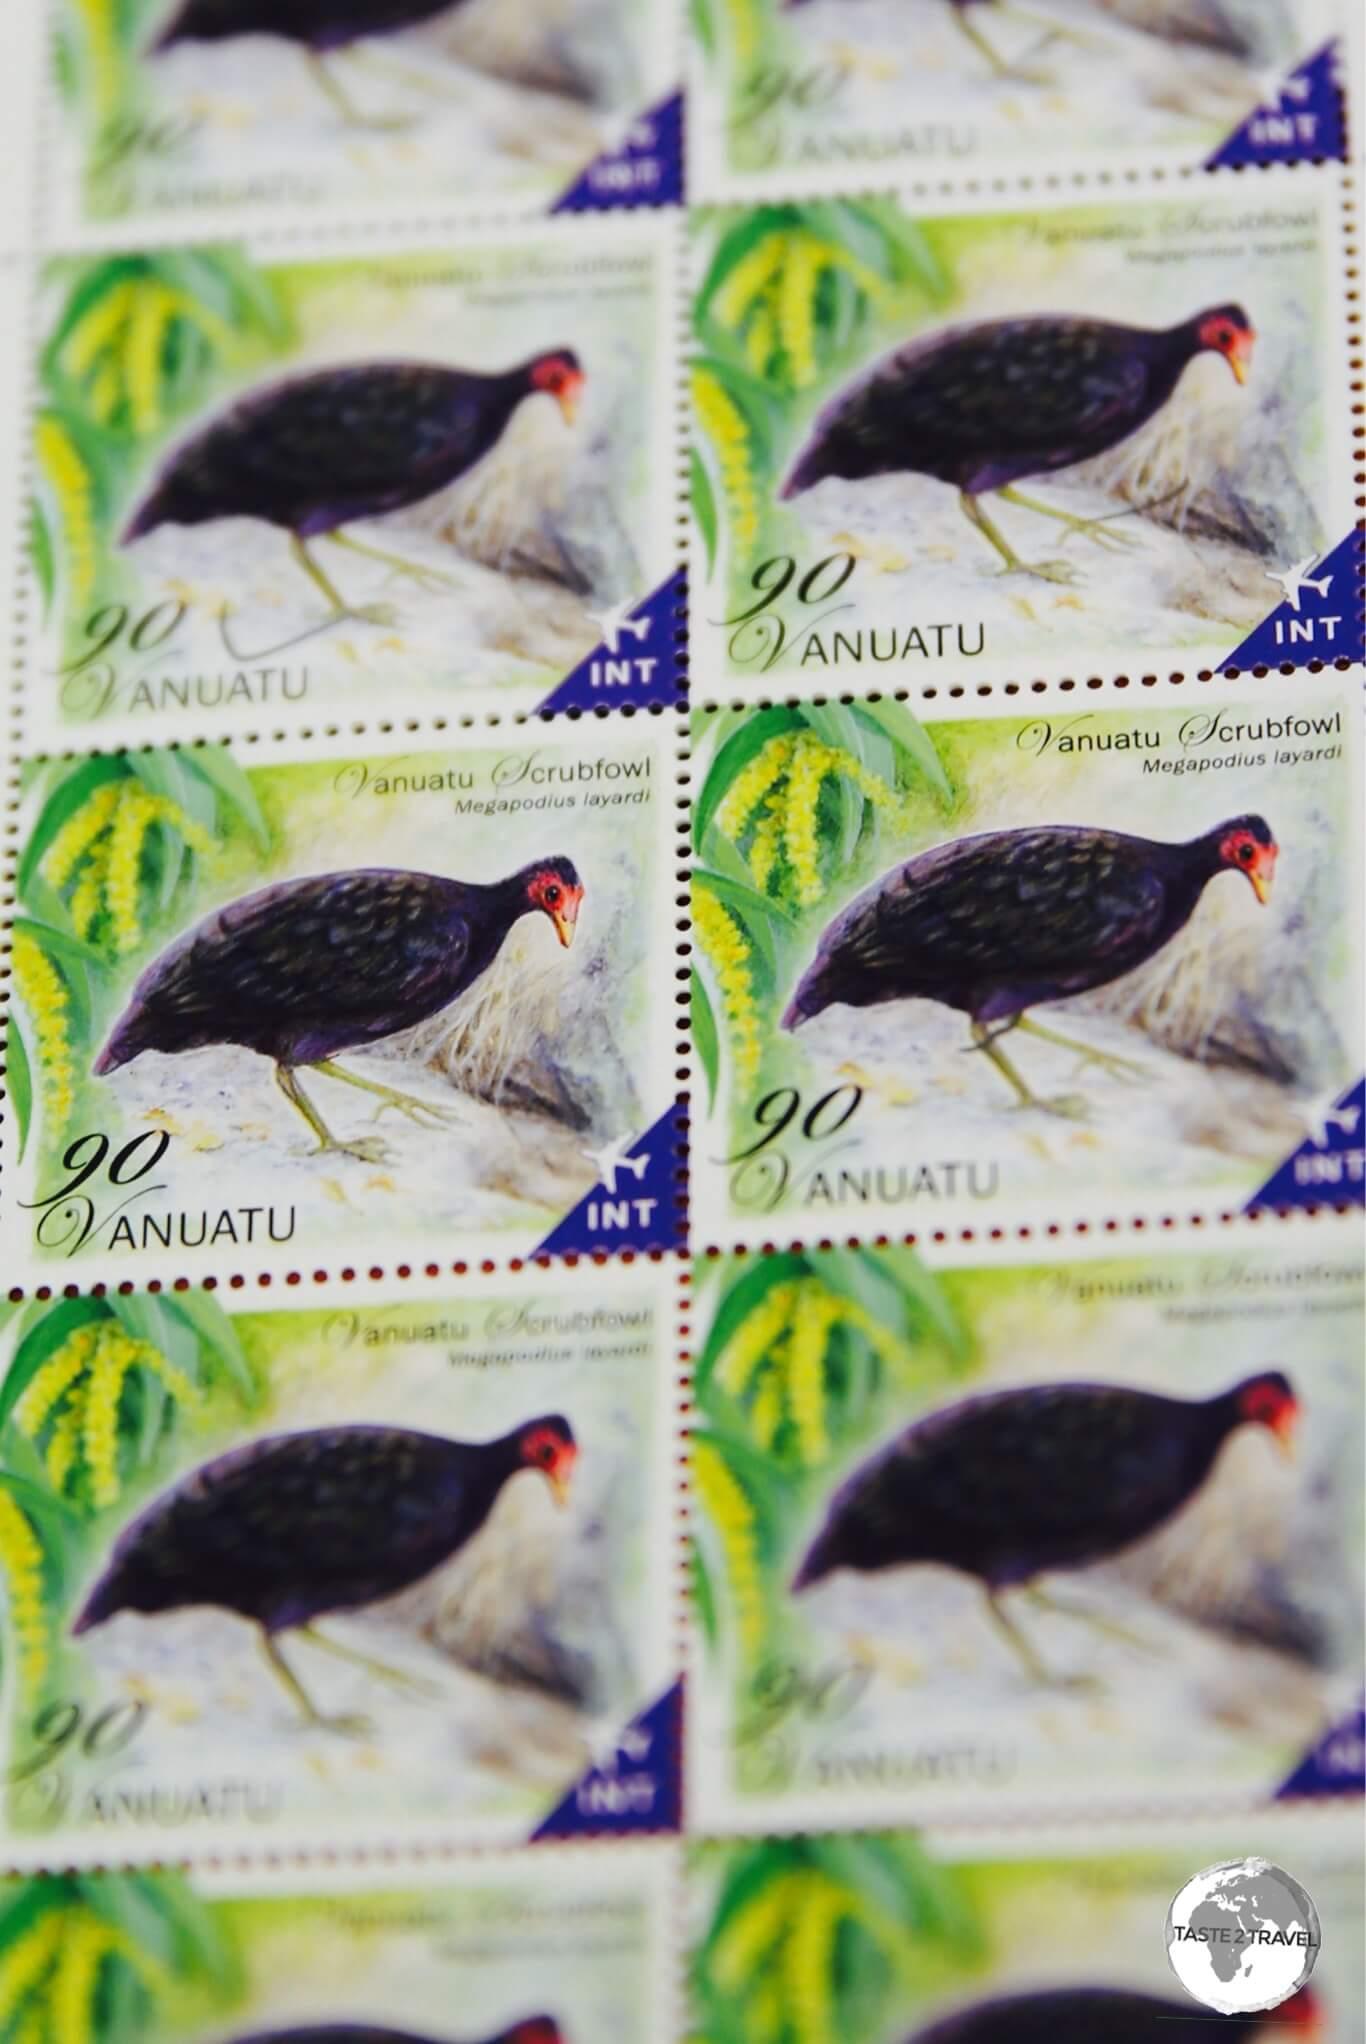 Vanuatu stamps are popular among philatelists.